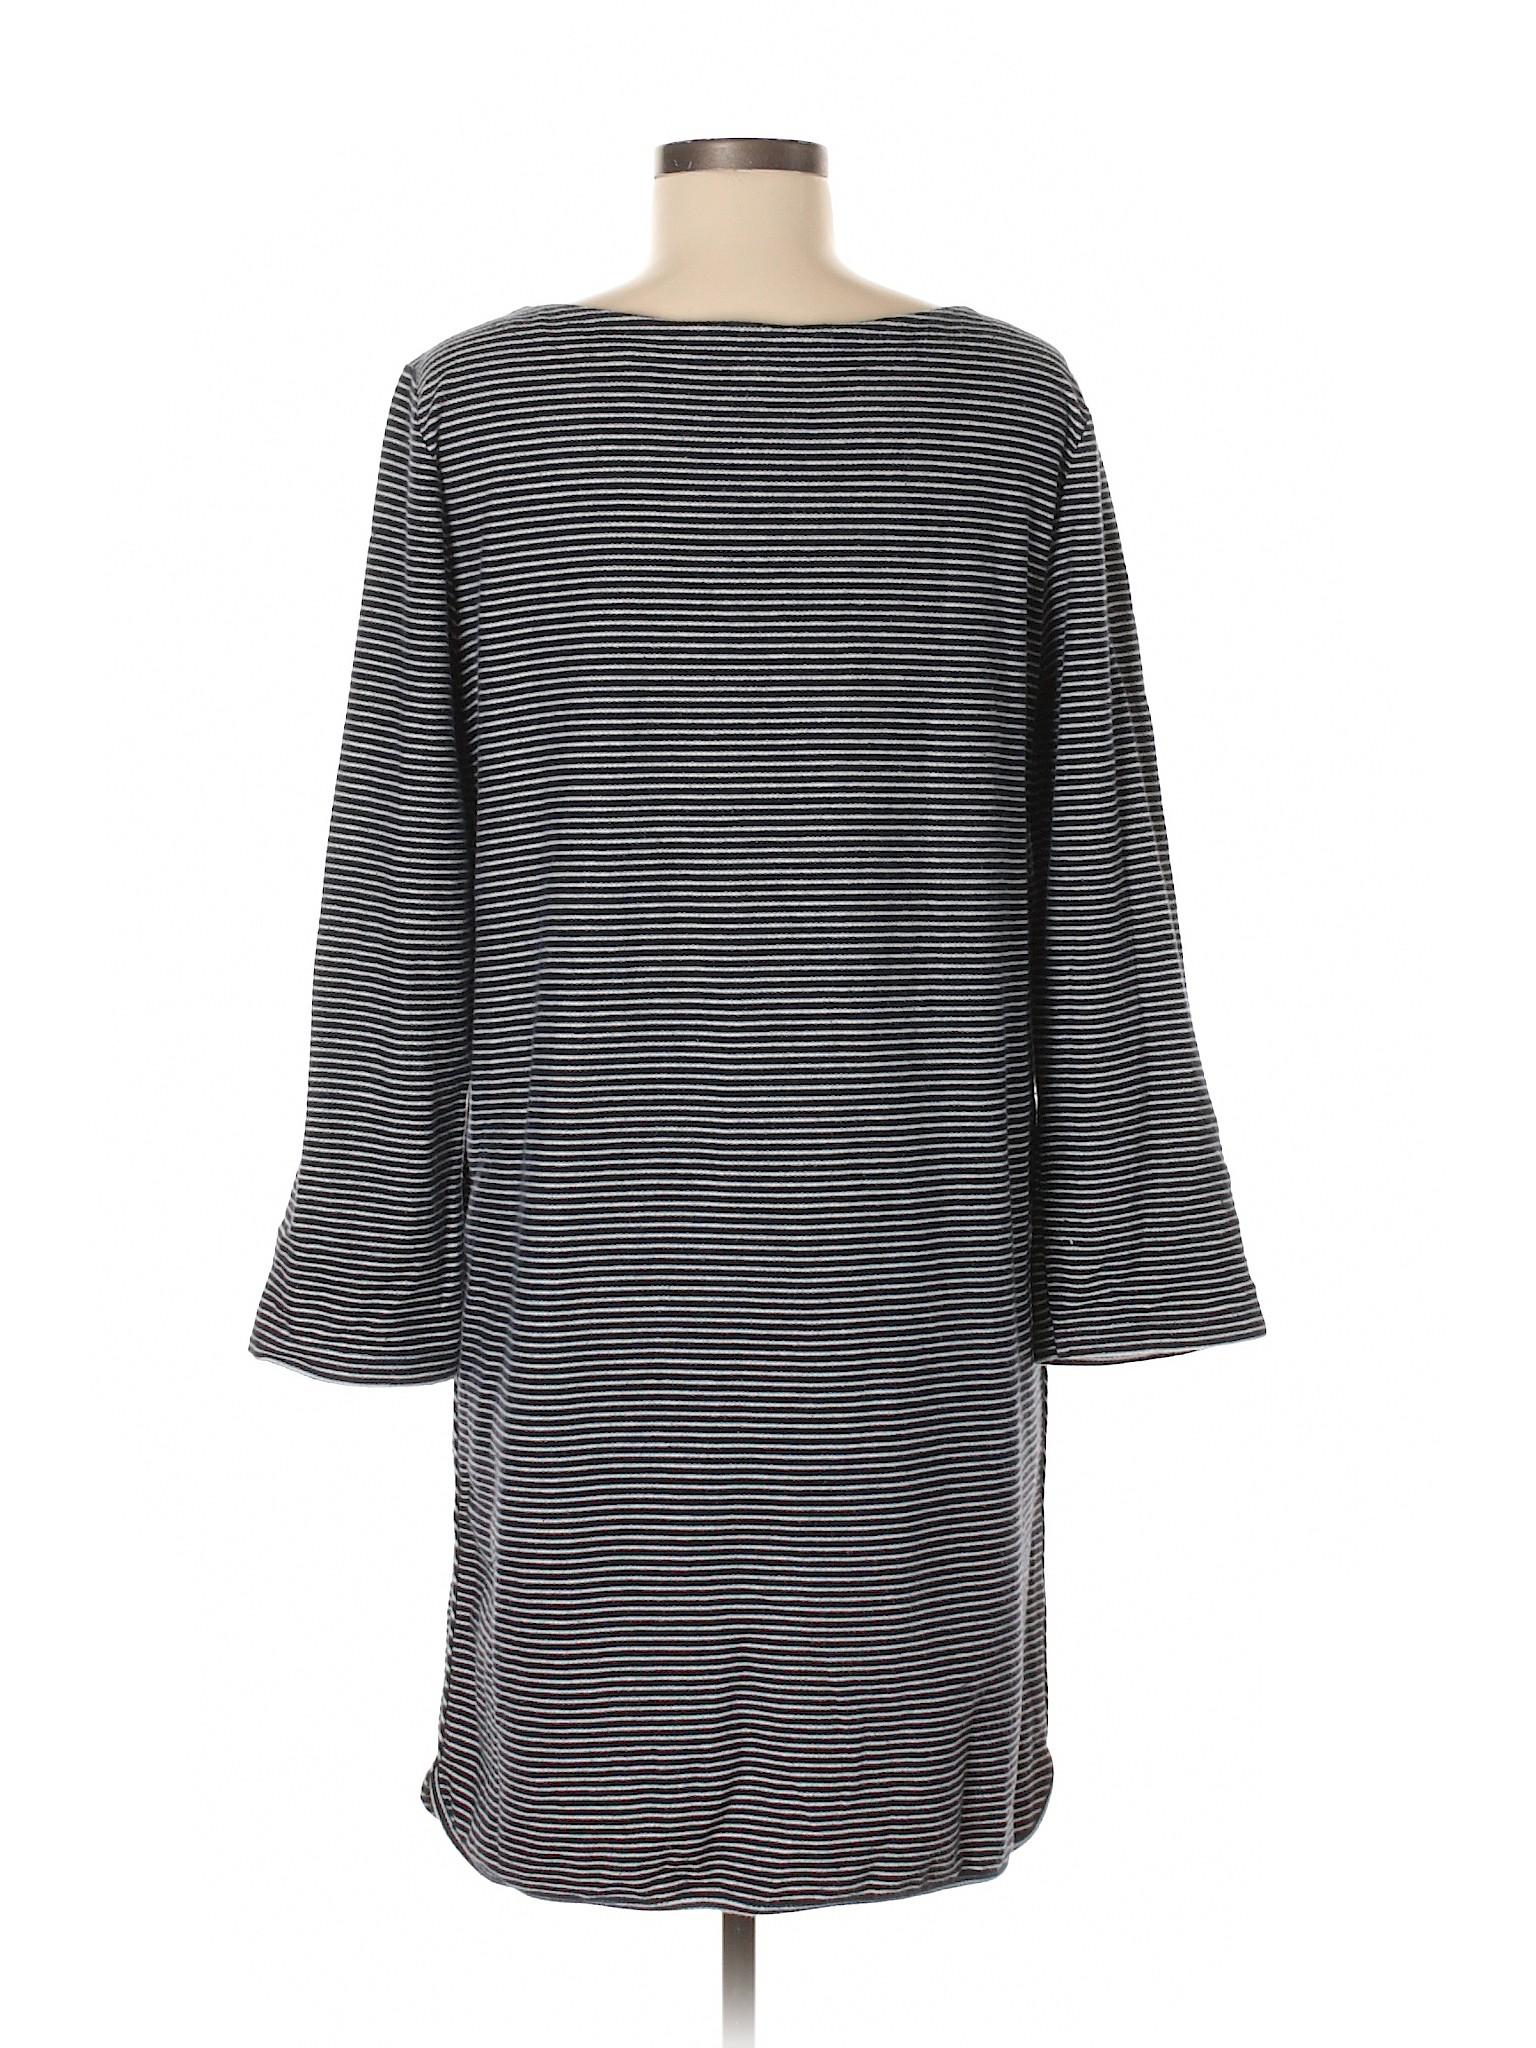 Taylor LOFT Casual Dress Boutique Ann winter xAnaEP